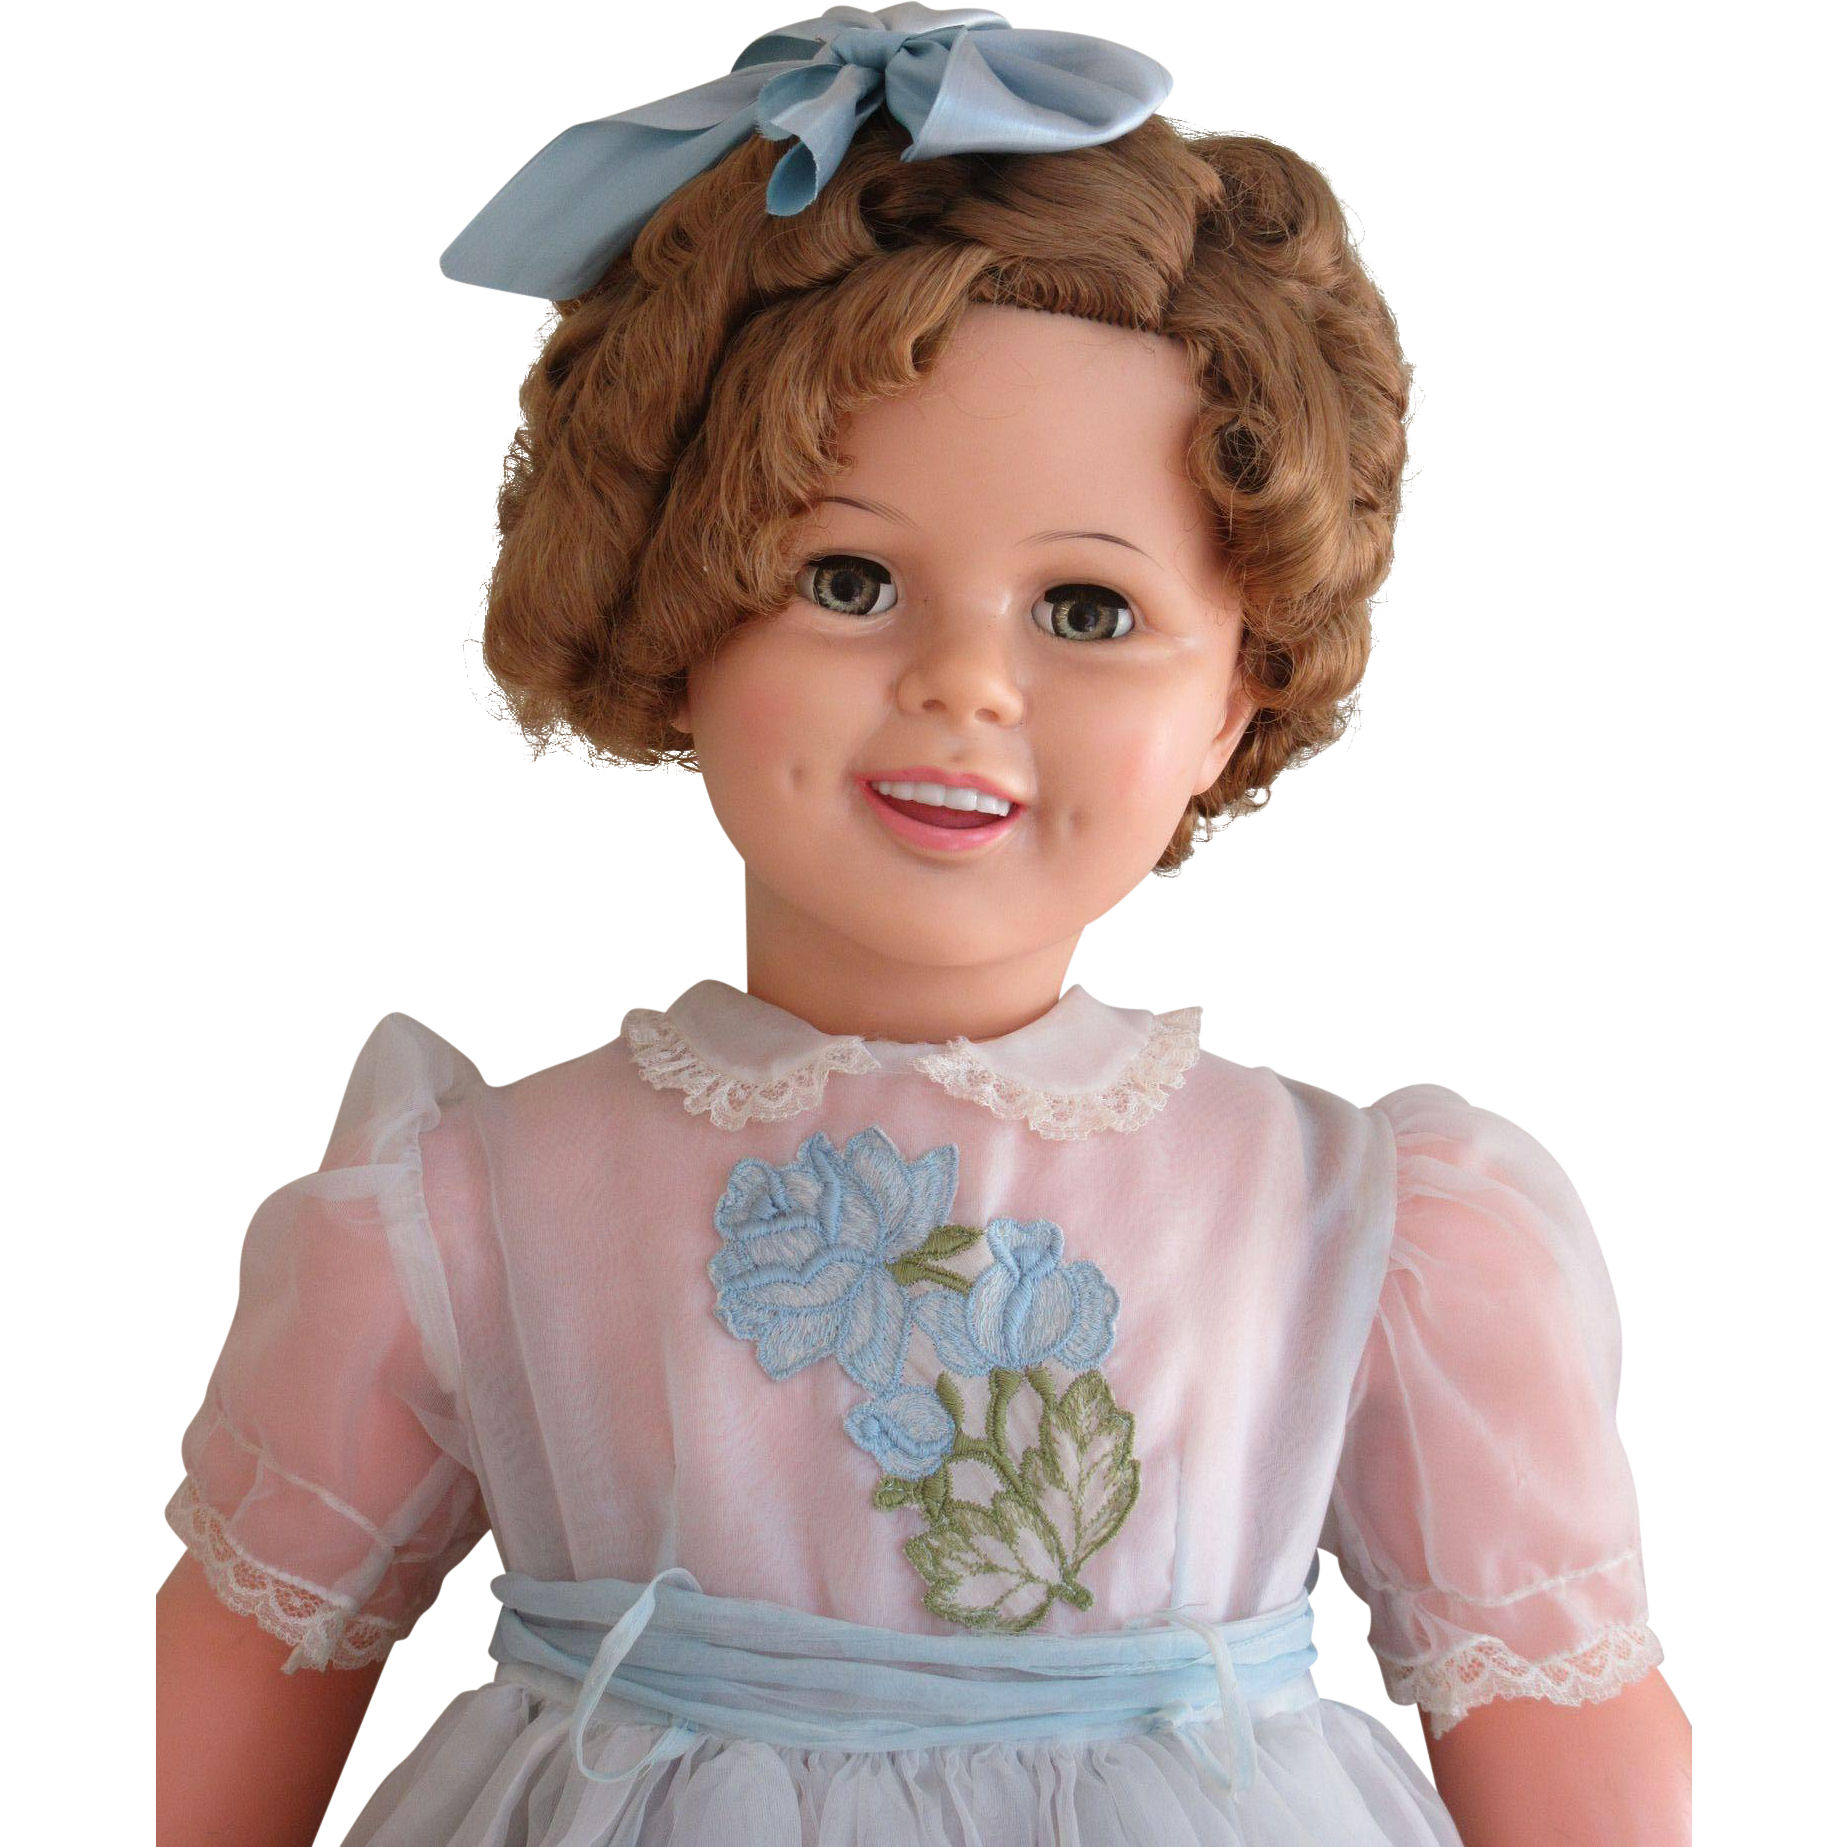 Gorgeous Patti Playpal Shirley Temple Doll-1959